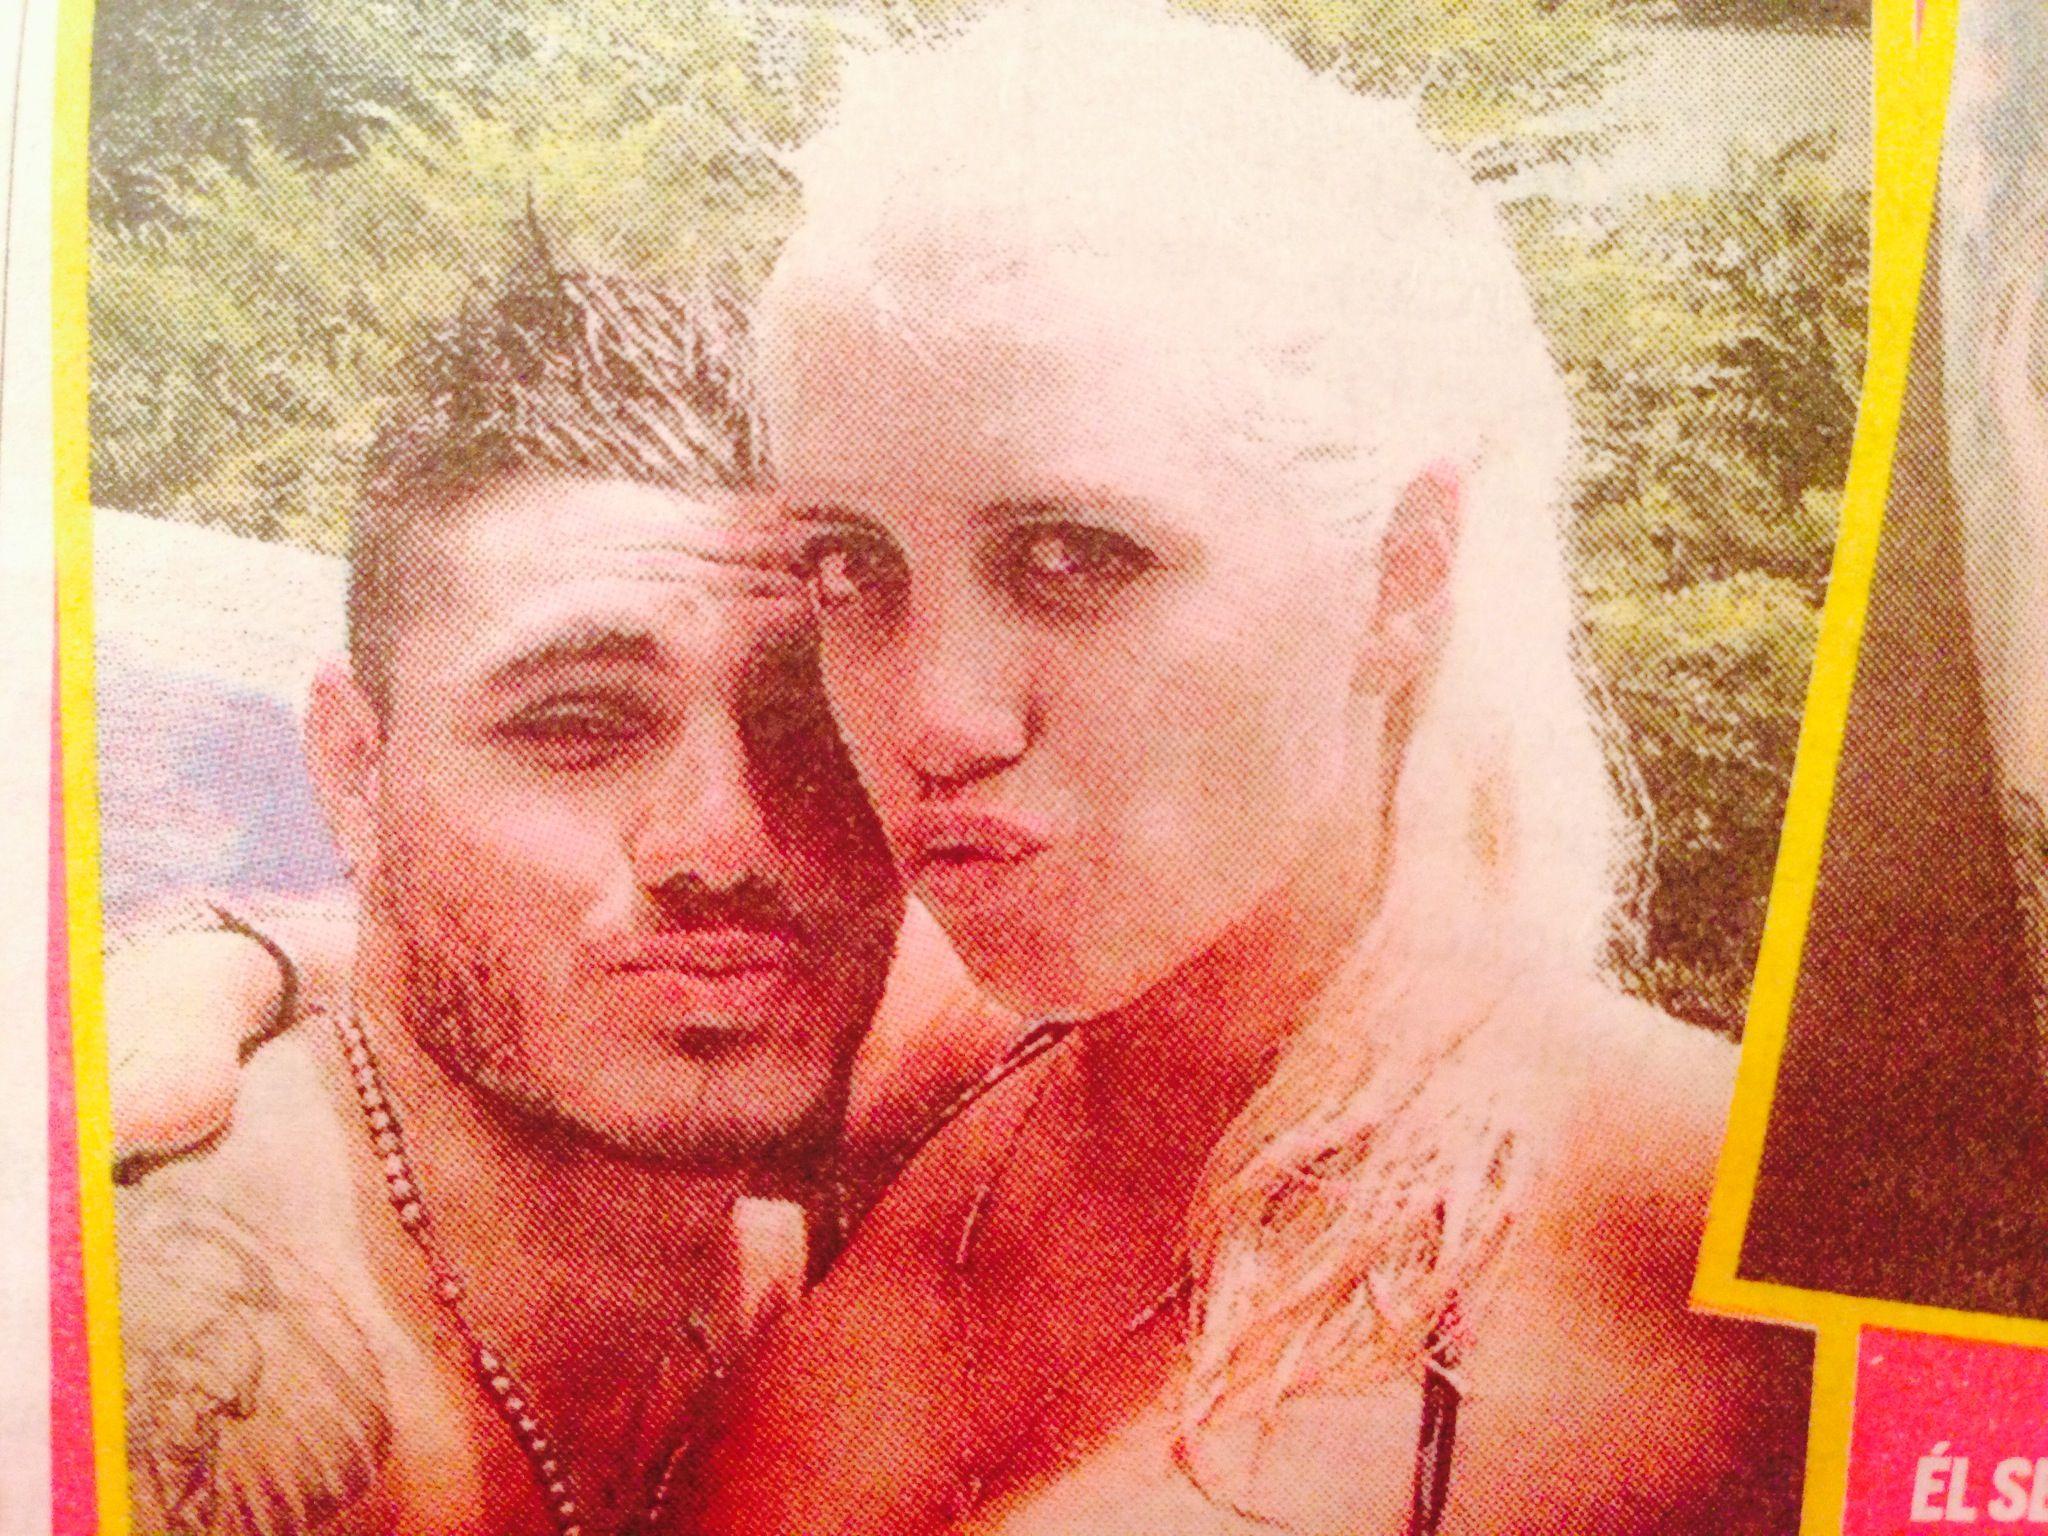 Luna de miel con tatuaje: la imagen que no favorece para nada a Wanda e Icardi